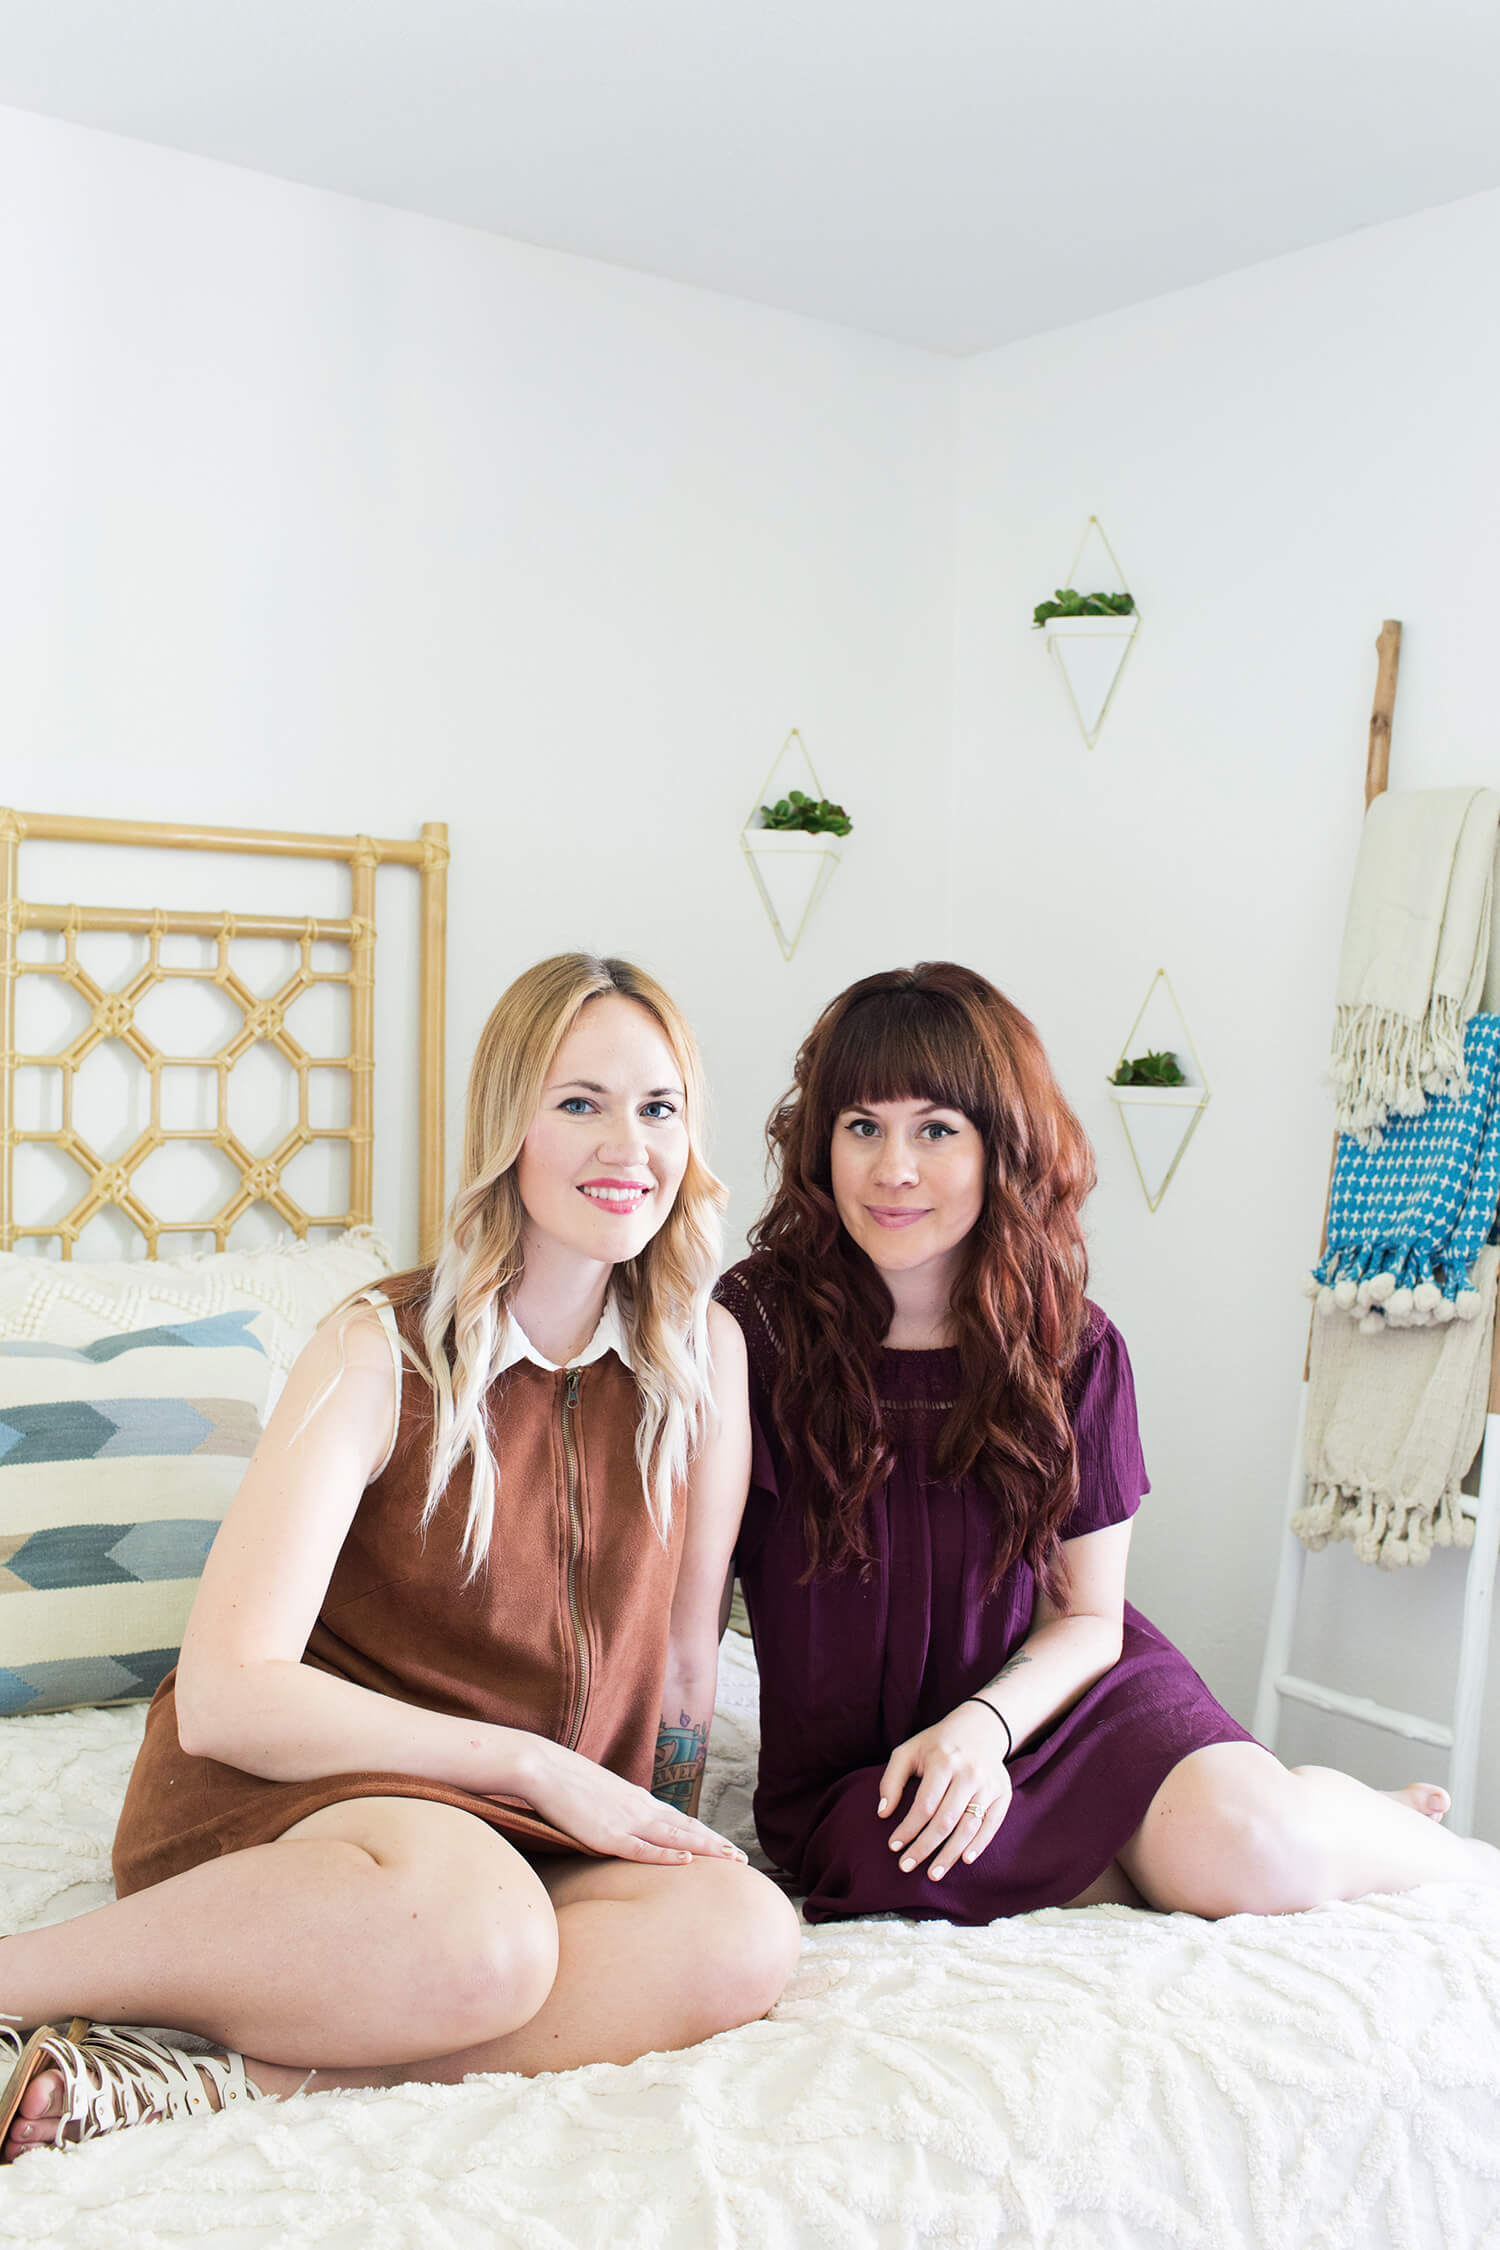 Emma Chapman and Elsie Larson